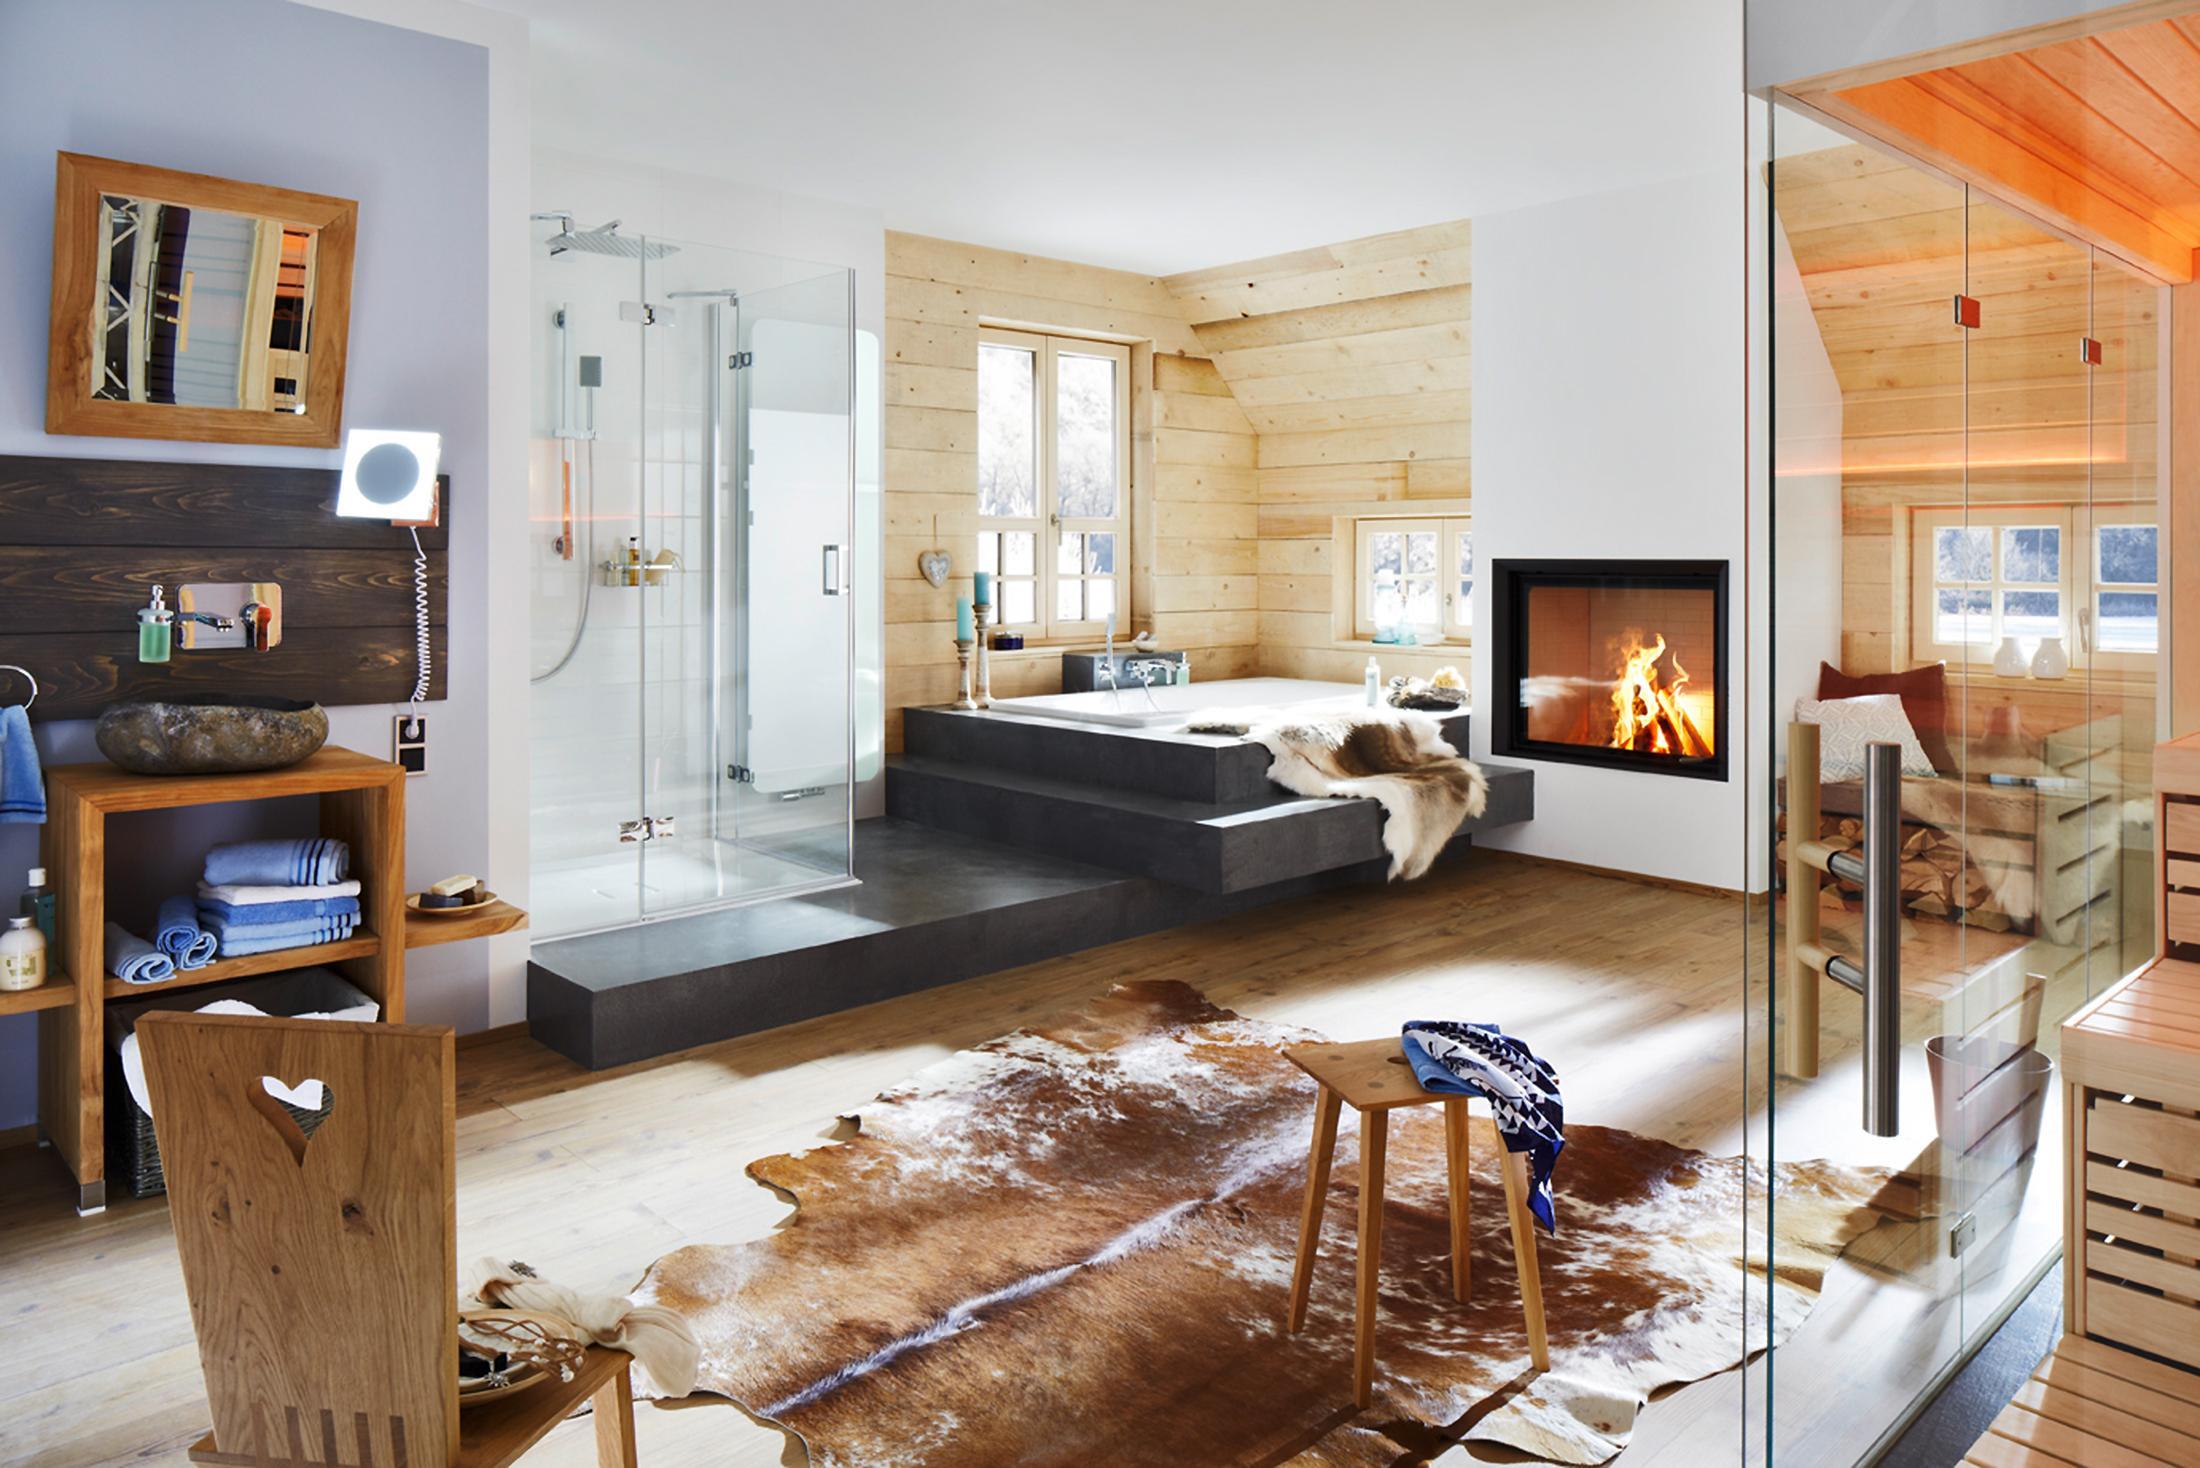 Badezimmer mit uriger Atmosphäre #stuhl #hocker #tep...